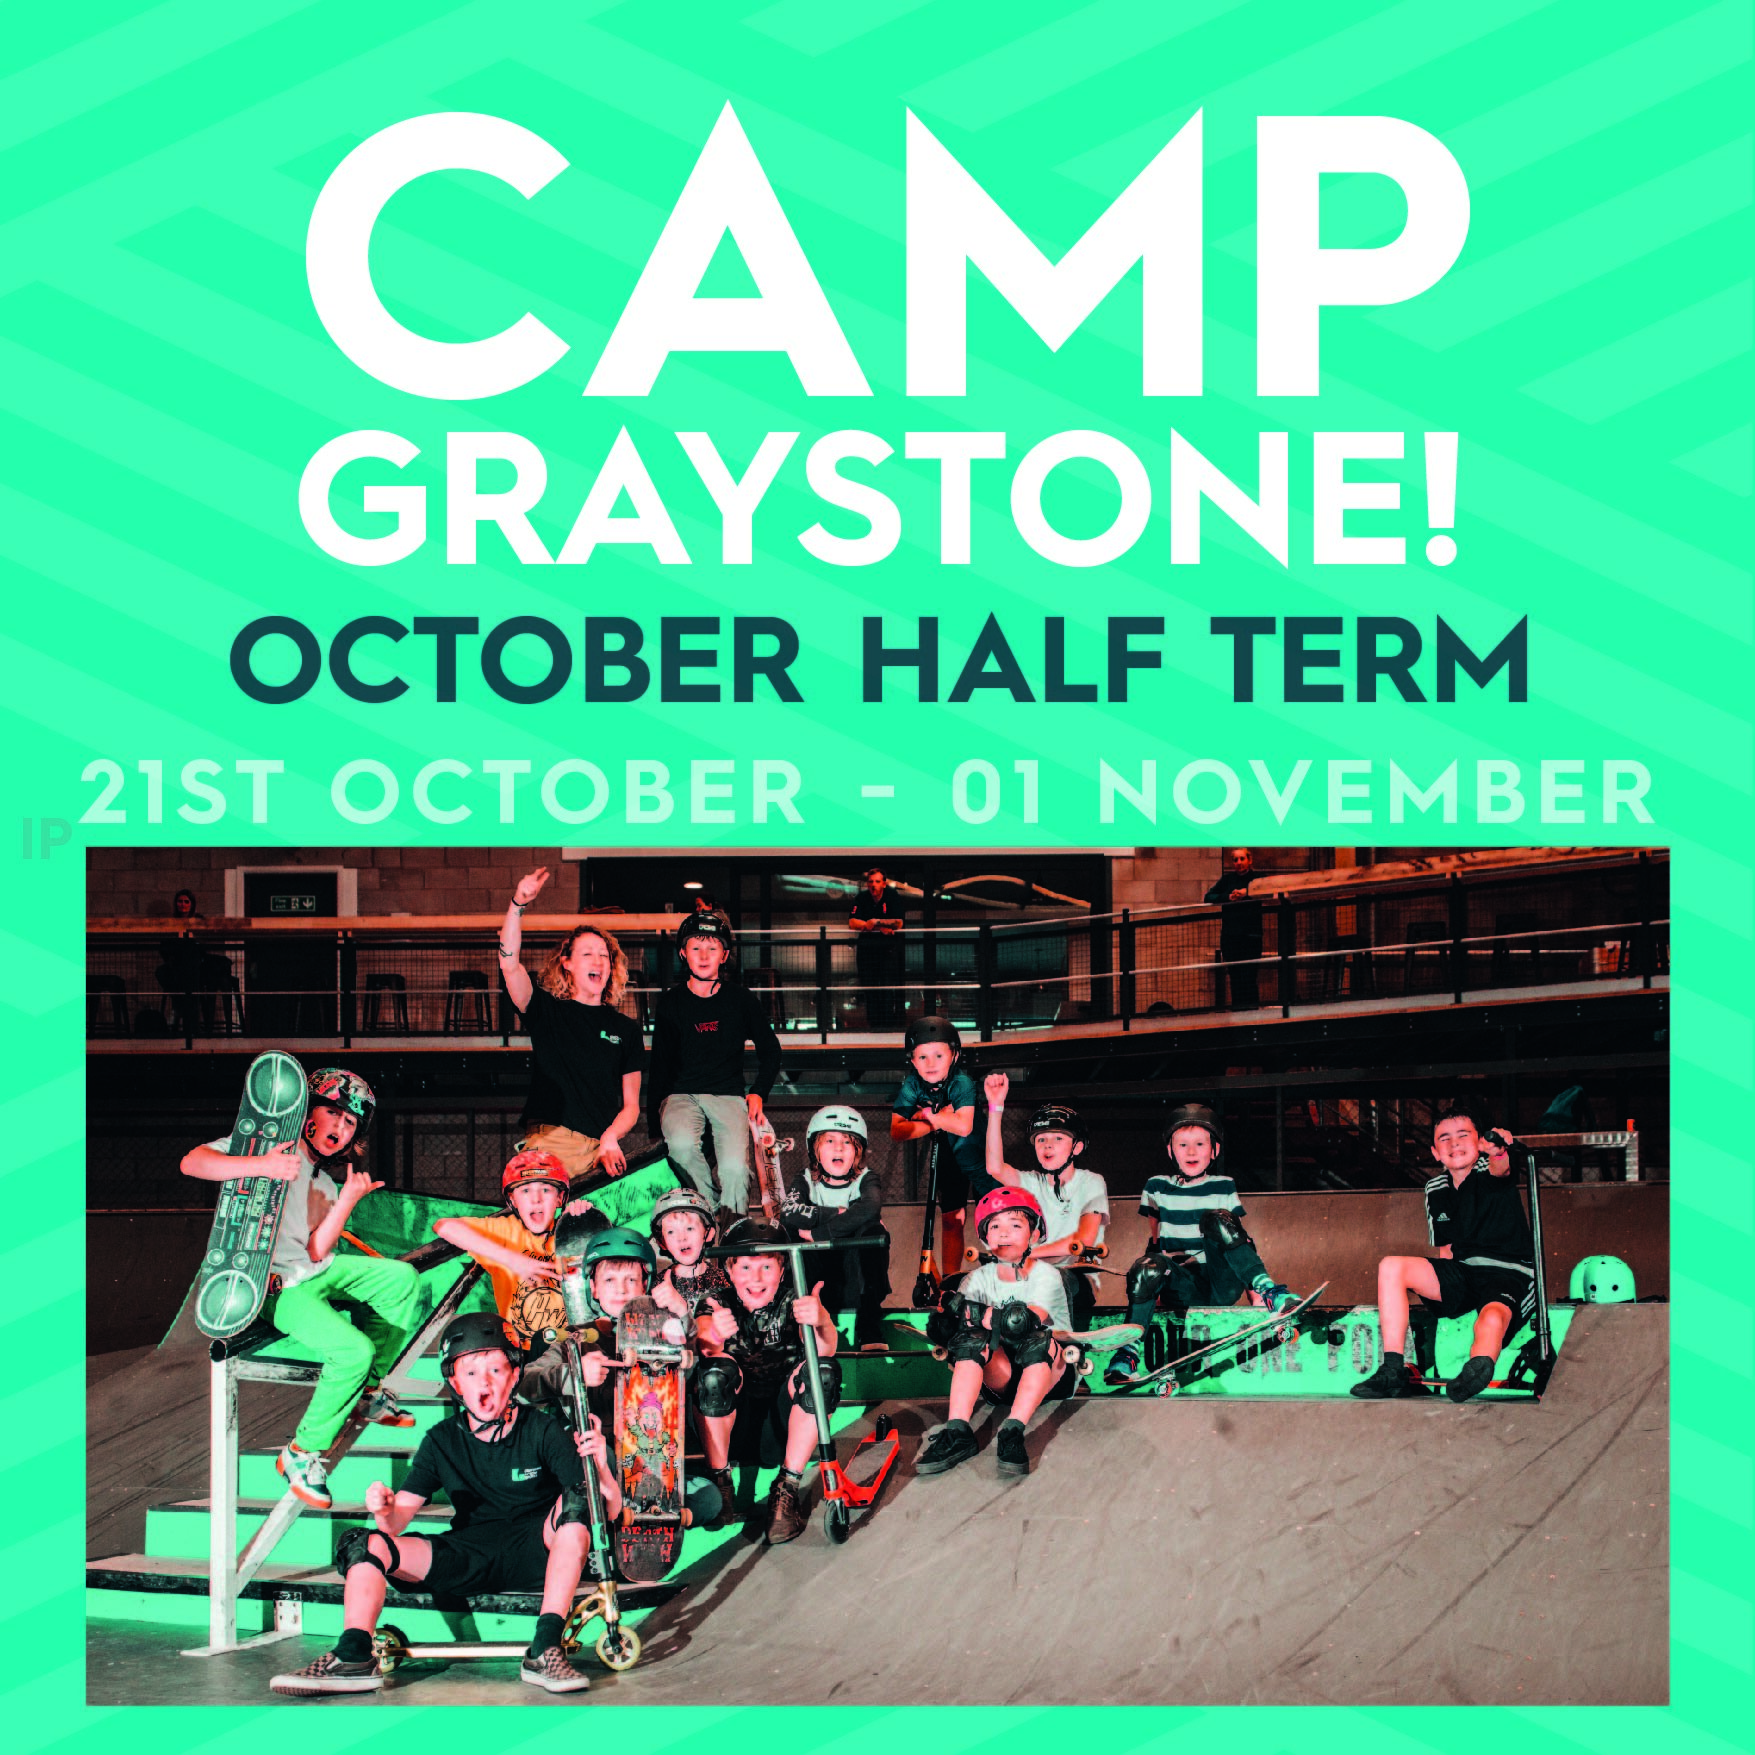 camp-graystone october-02.jpg